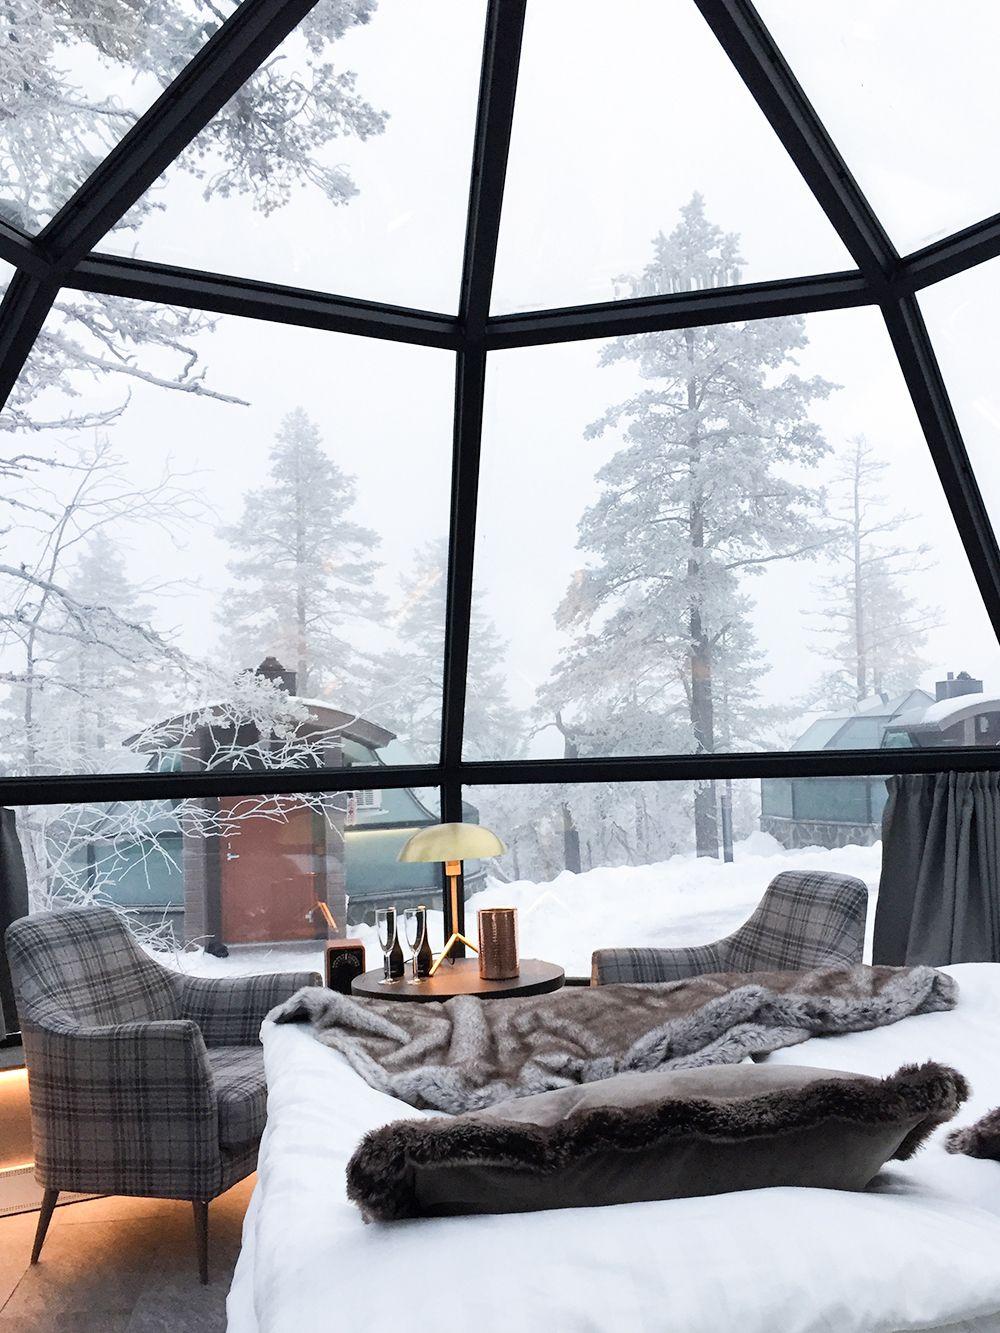 Seeking Northern Lights in Lapland at Levin Iglut resort   My ...